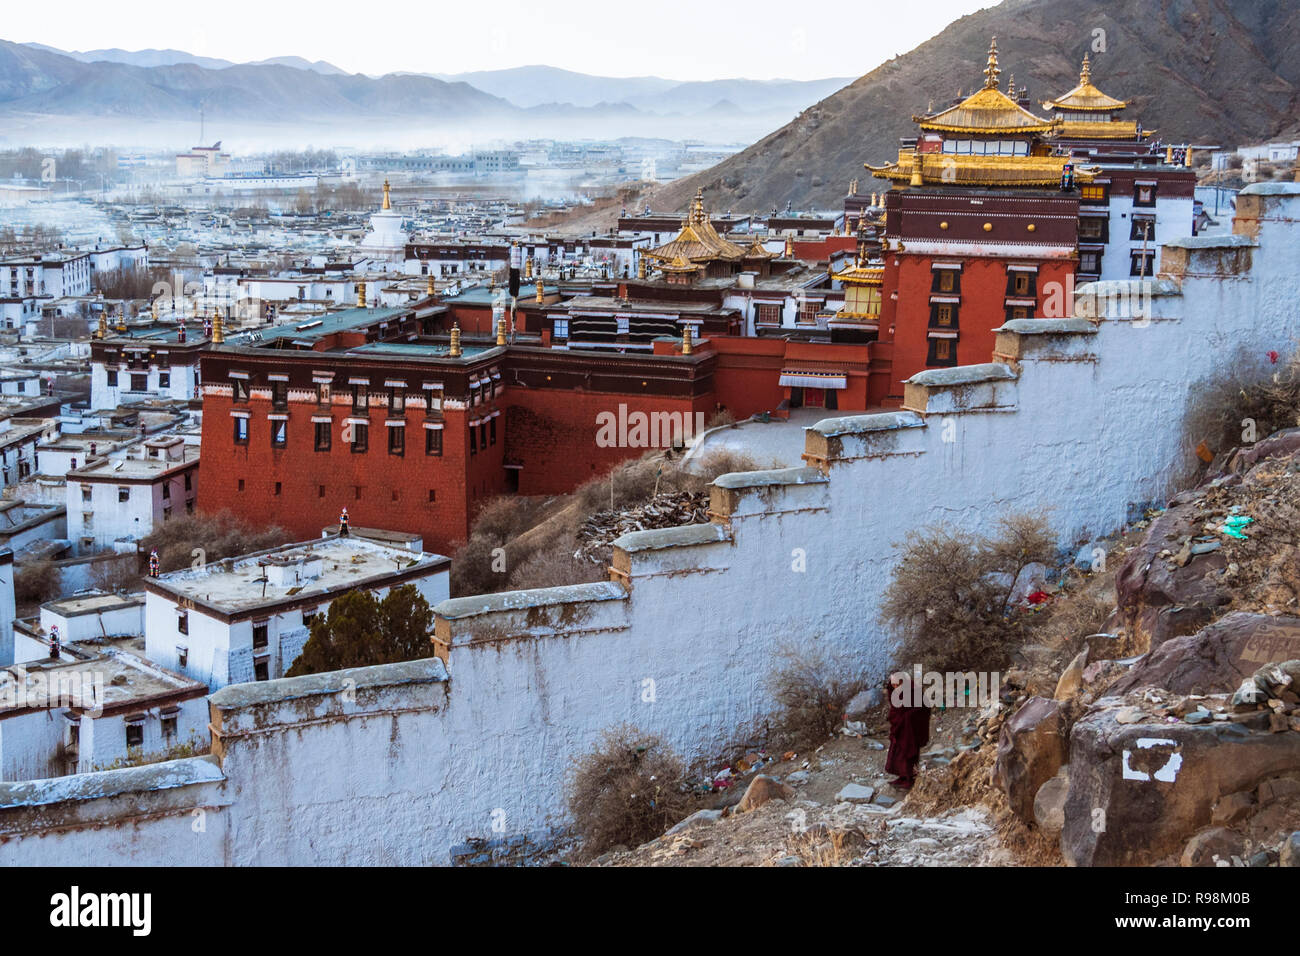 Shigatse, Tibet Autonomous Region, China : A Buddhist monk walk outside the walls of Tashi Lhunpo Monastery, the traditional seat of the Panchen Lama  - Stock Image